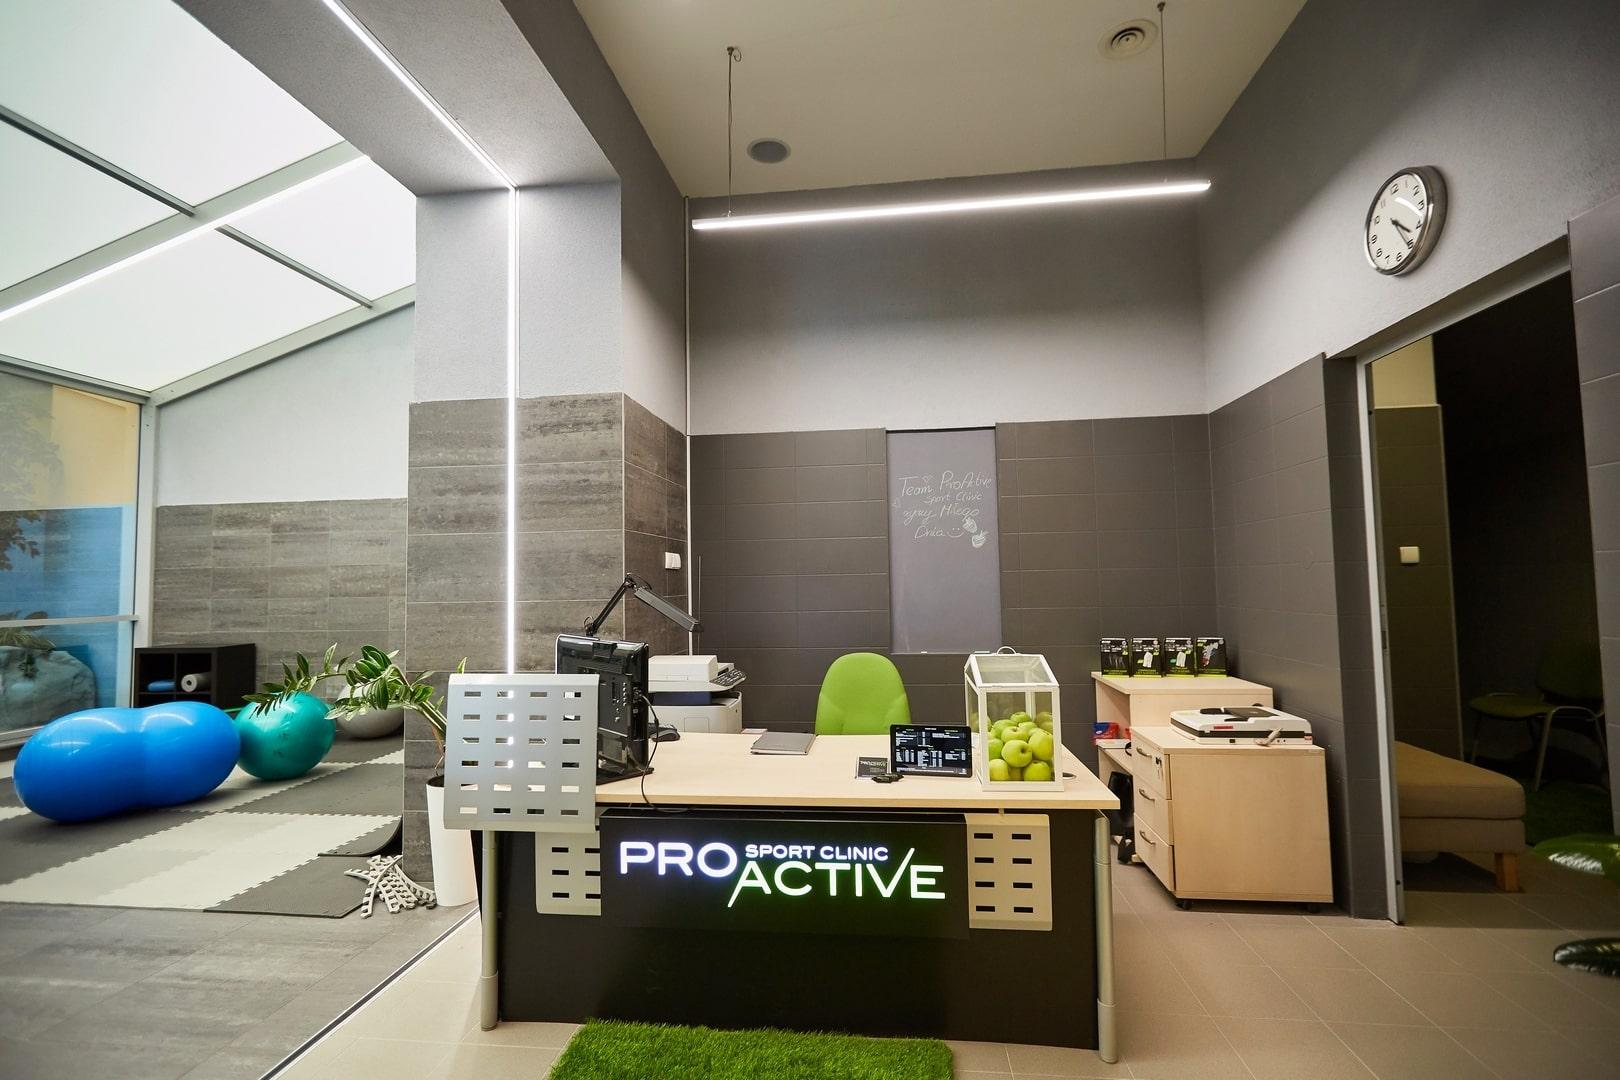 fizjoterapia siedlce proactive sport clinic